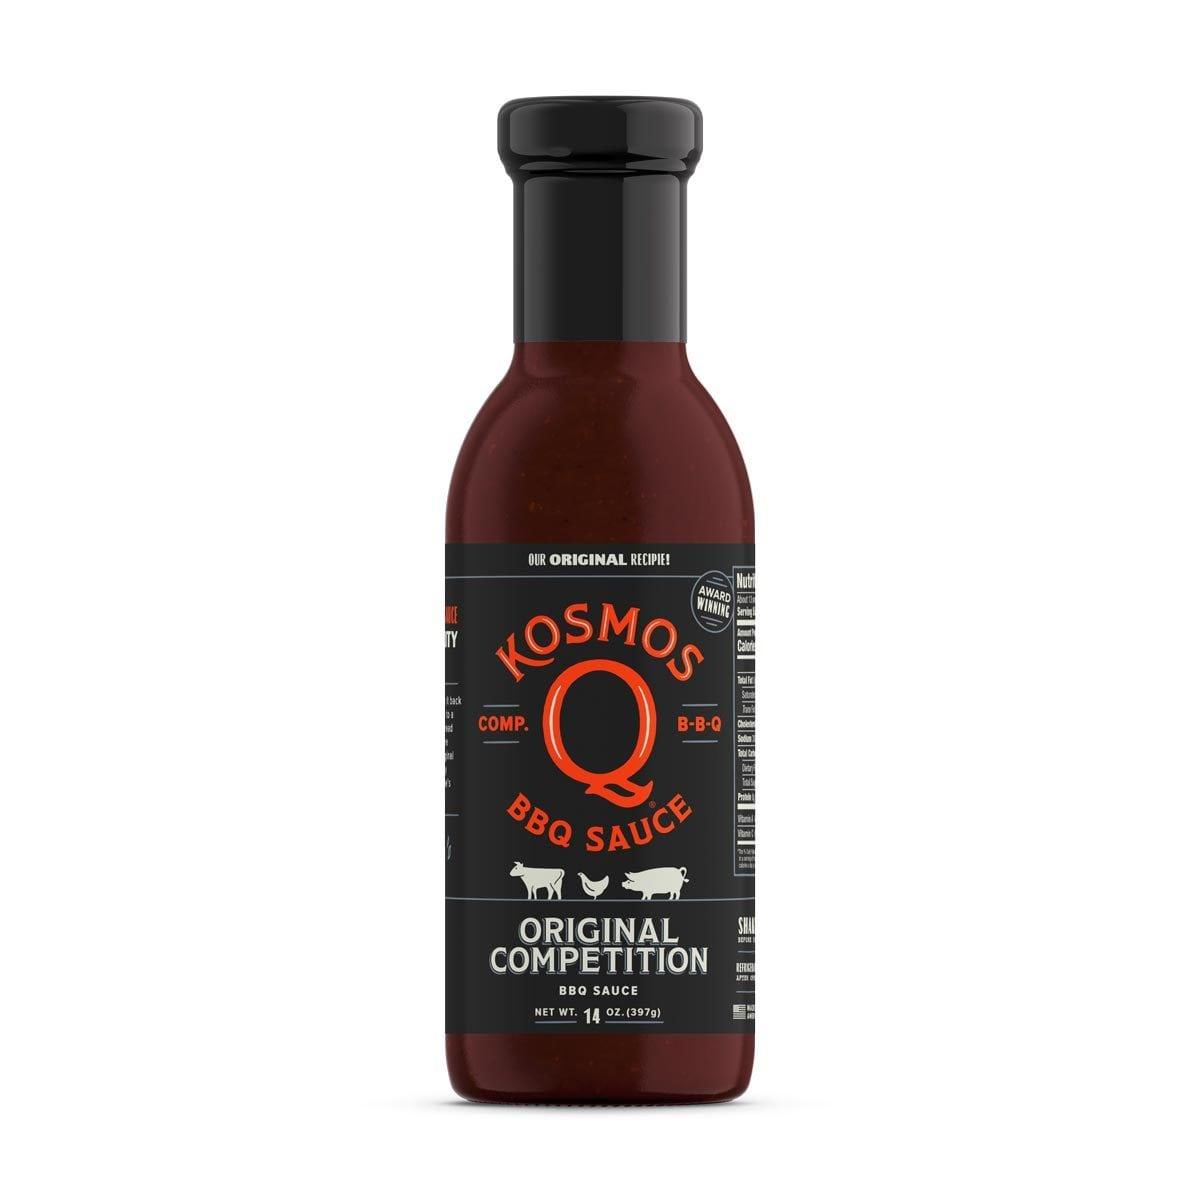 Kosmos-Q-Competition-BBQ-Sauce-1.jpg